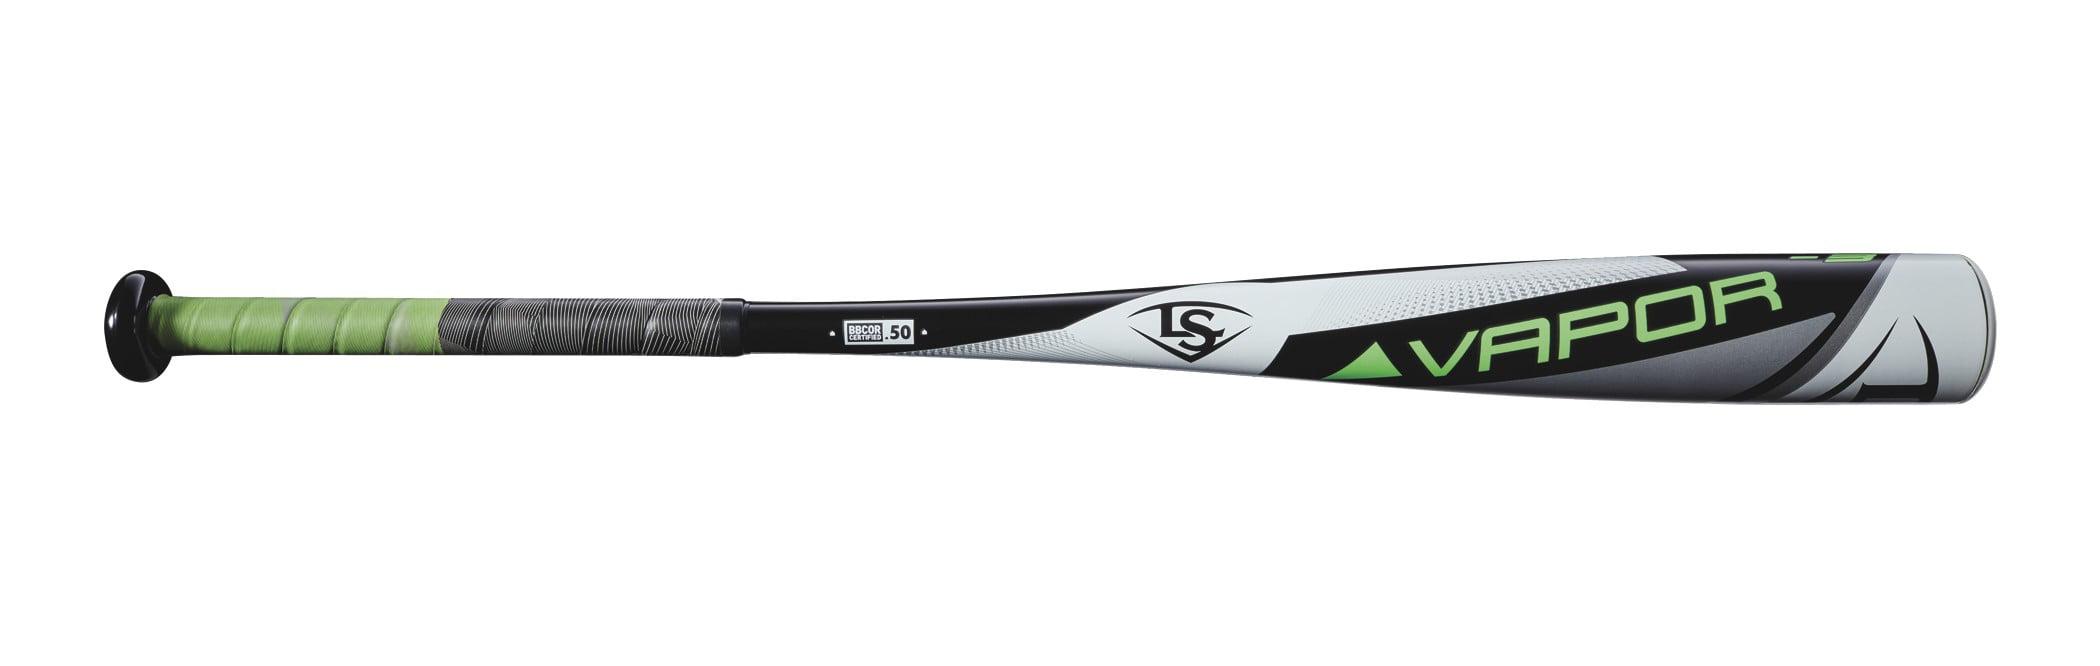 "Louisville Slugger Vapor (-3) 2 5 8"" BBCOR Baseball Bat by Wilson Sporting Goods"